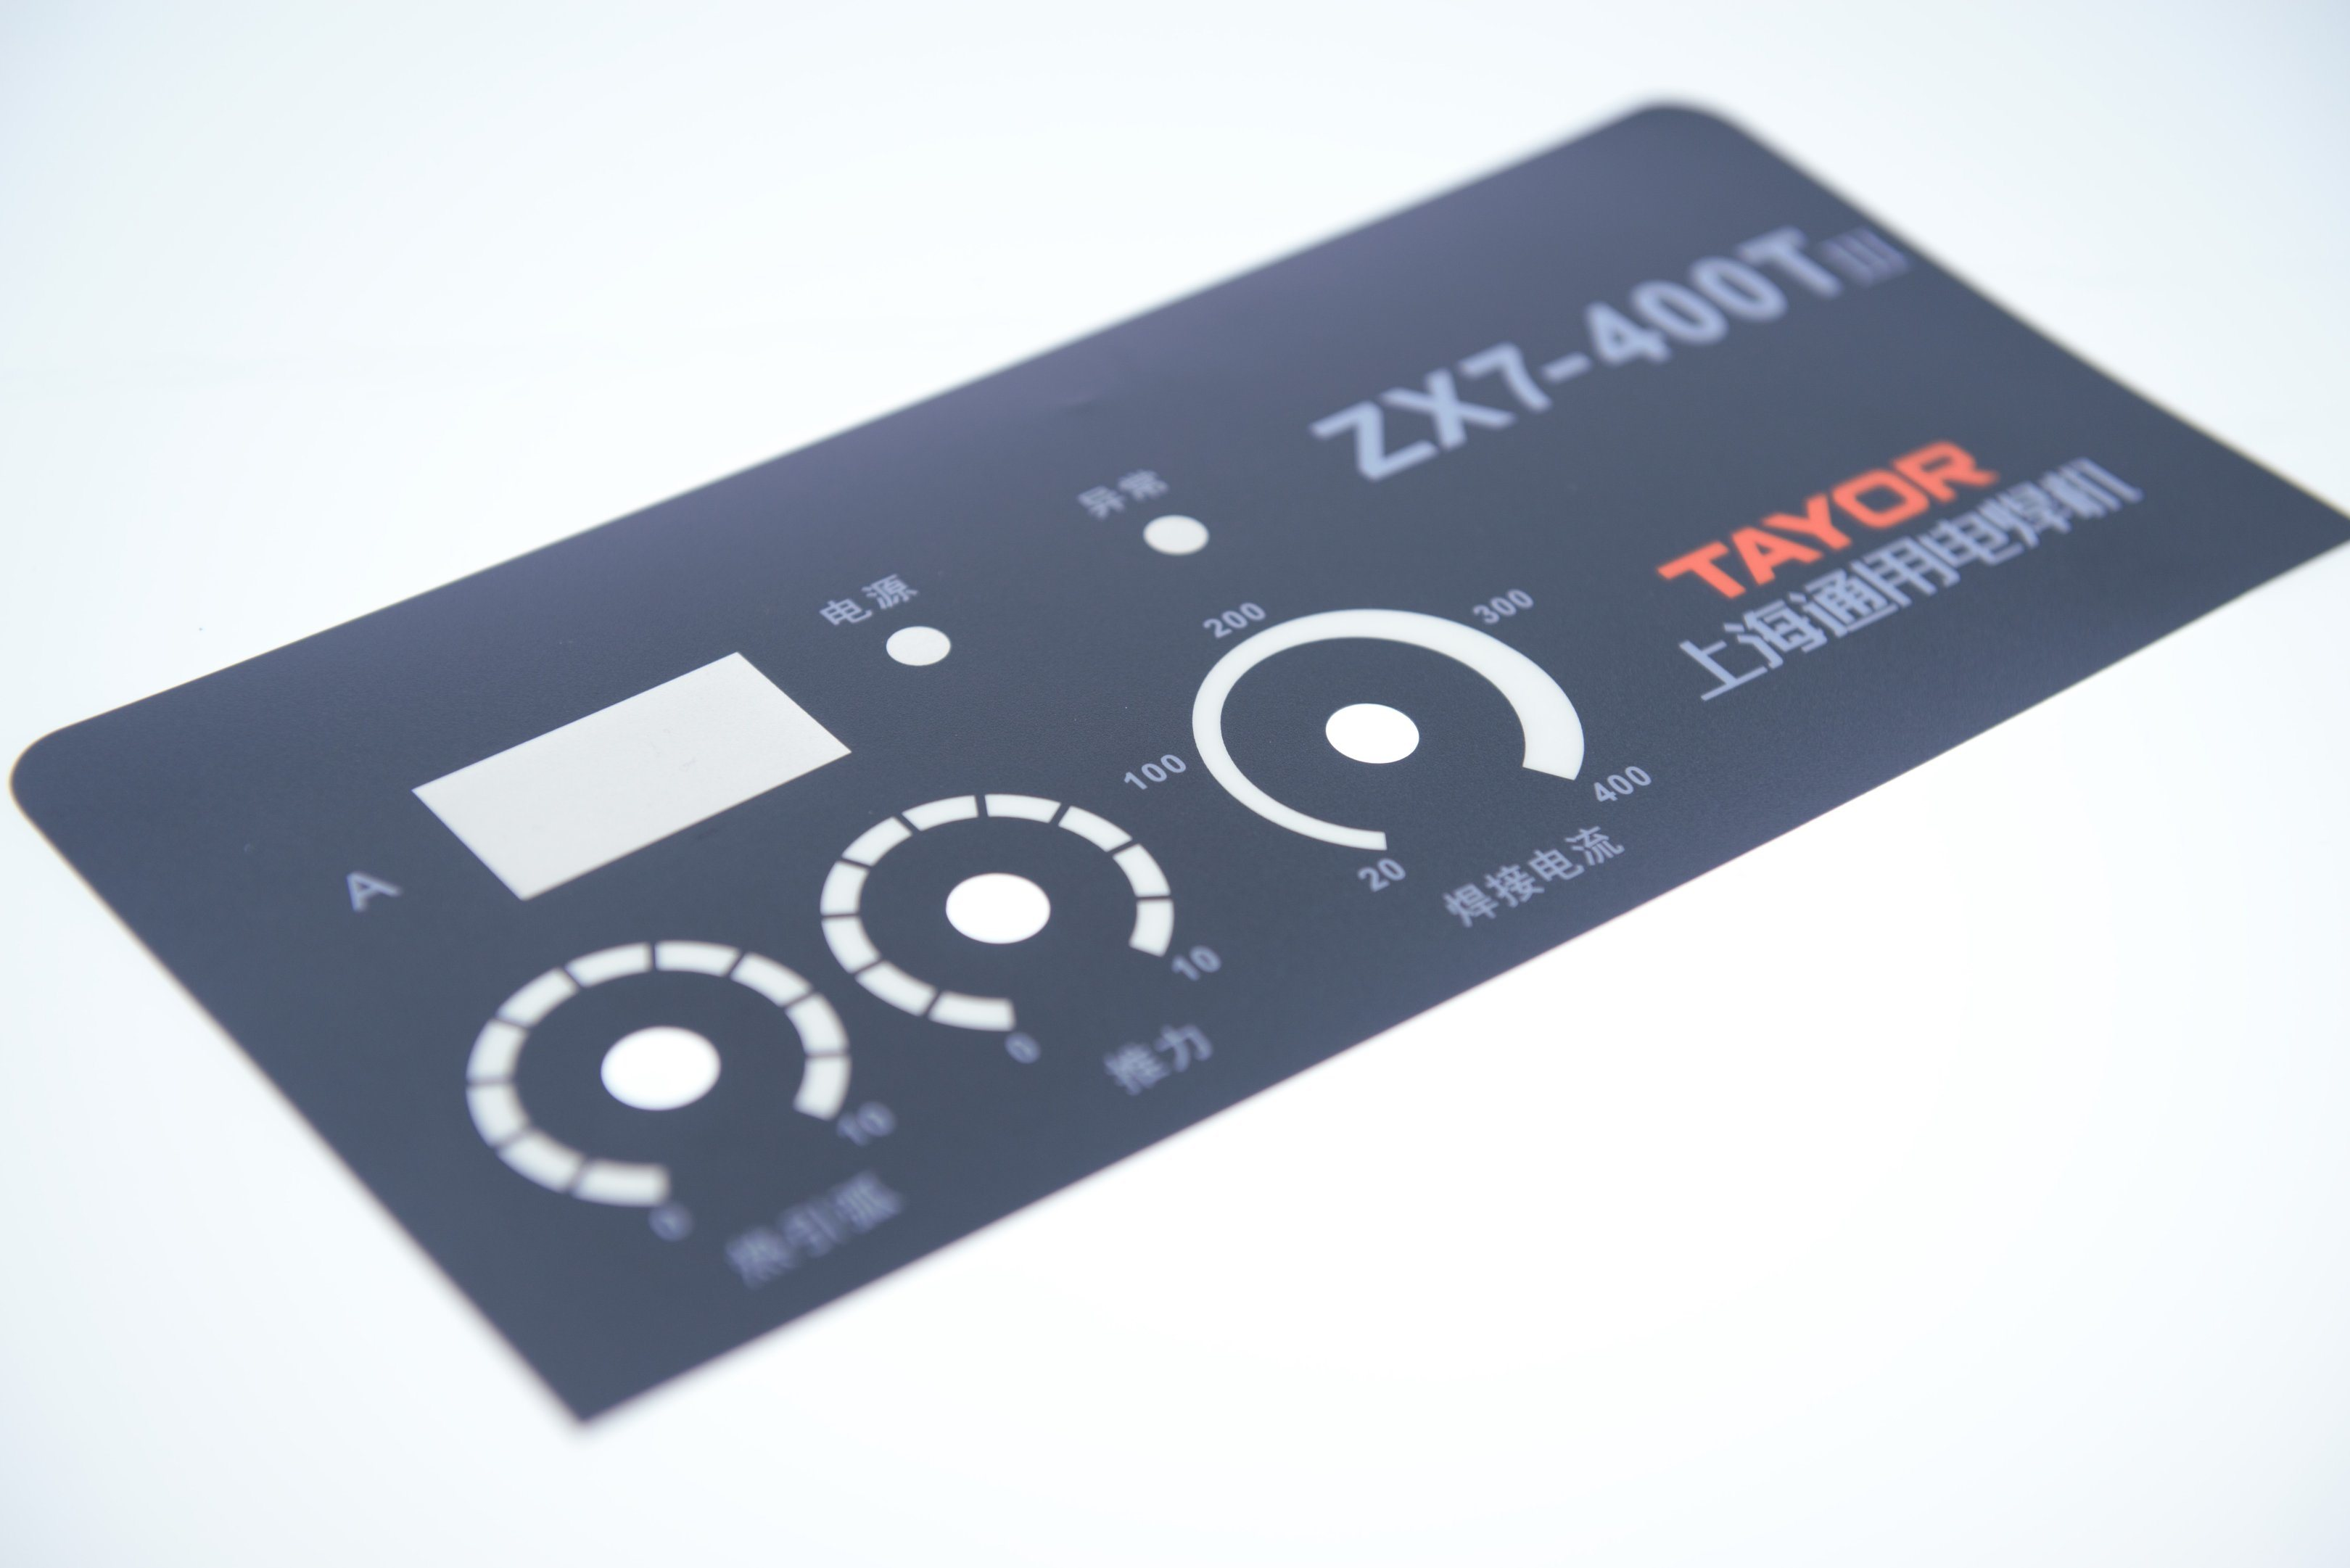 LED Keyboard Membrane Switch Thin Film Switch Keyboard Membrane Switch